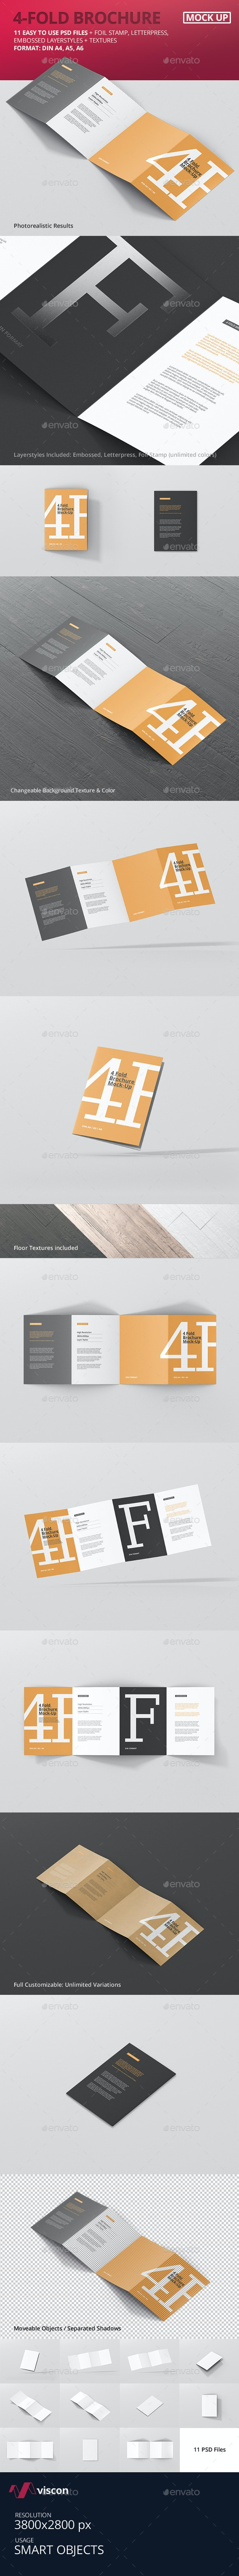 4-Fold Brochure Mockup - Din A4 A5 A6 - Brochures Print